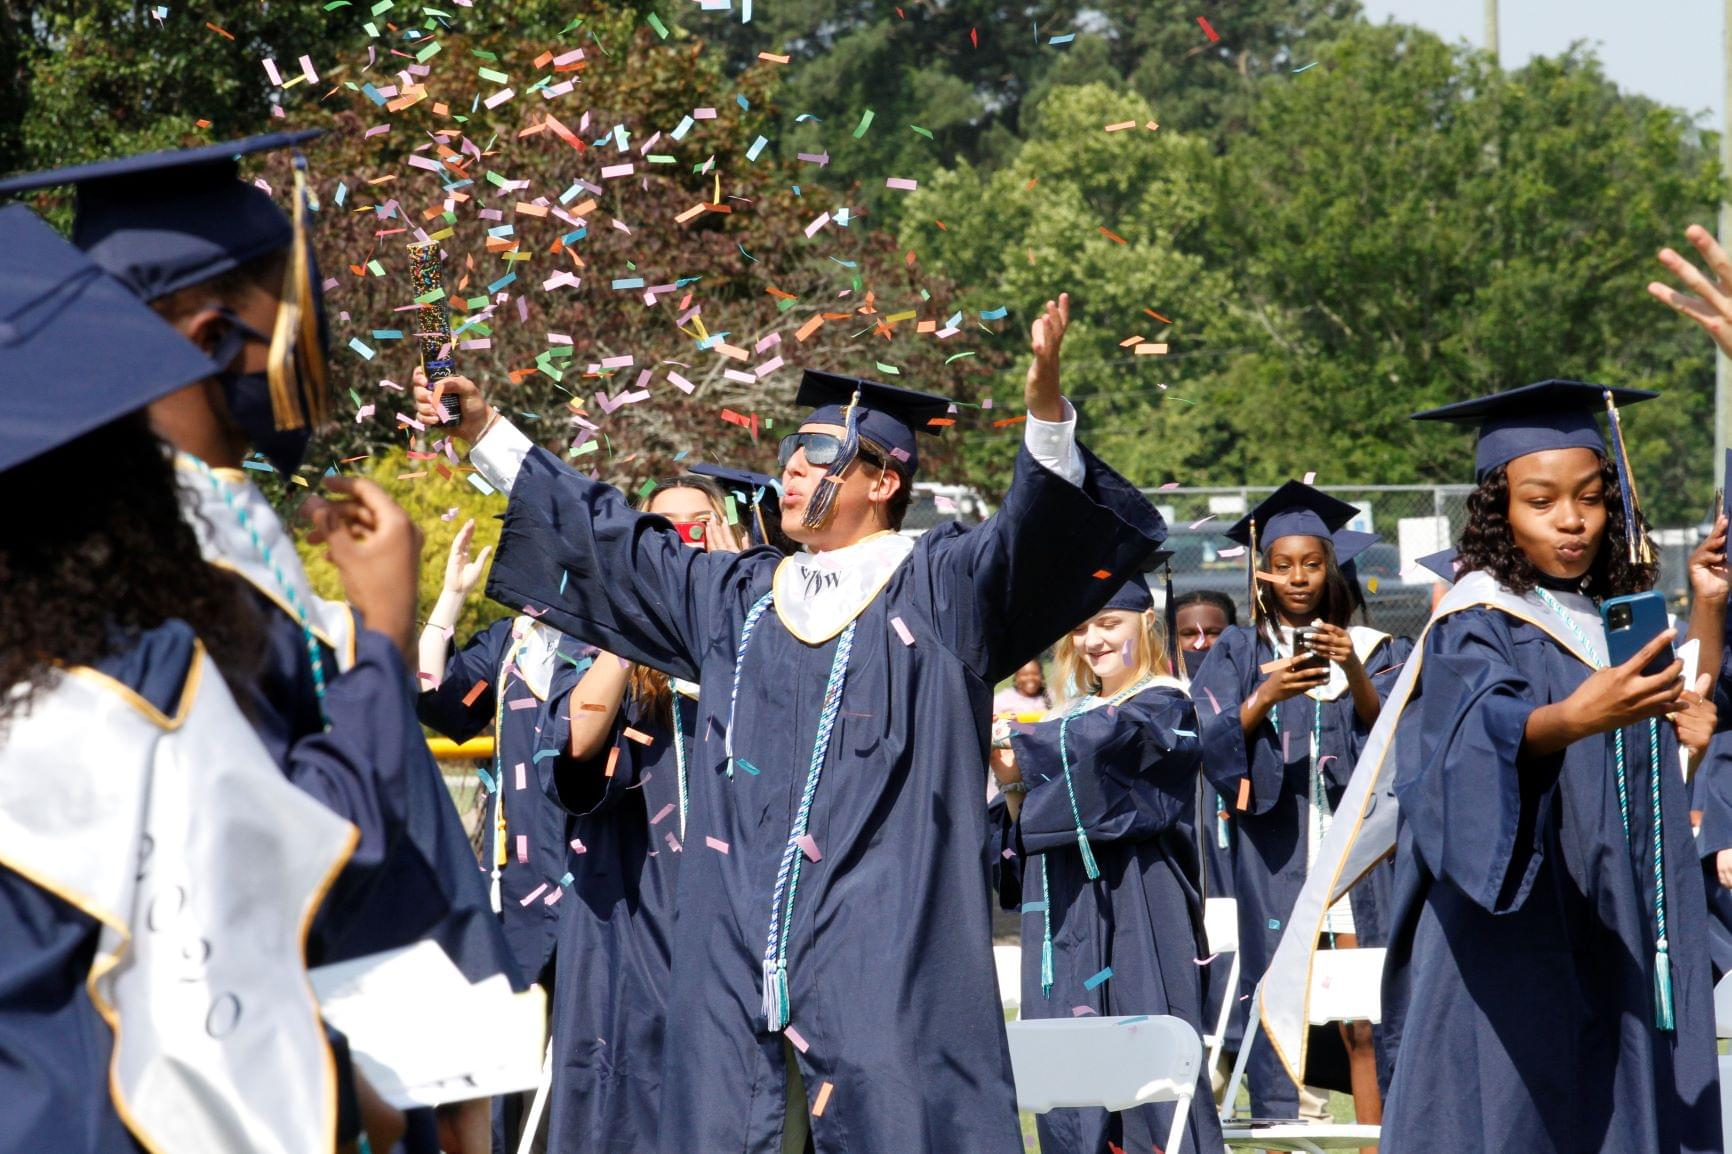 Eastern Wayne H.S. Graduation (PHOTO GALLERY)